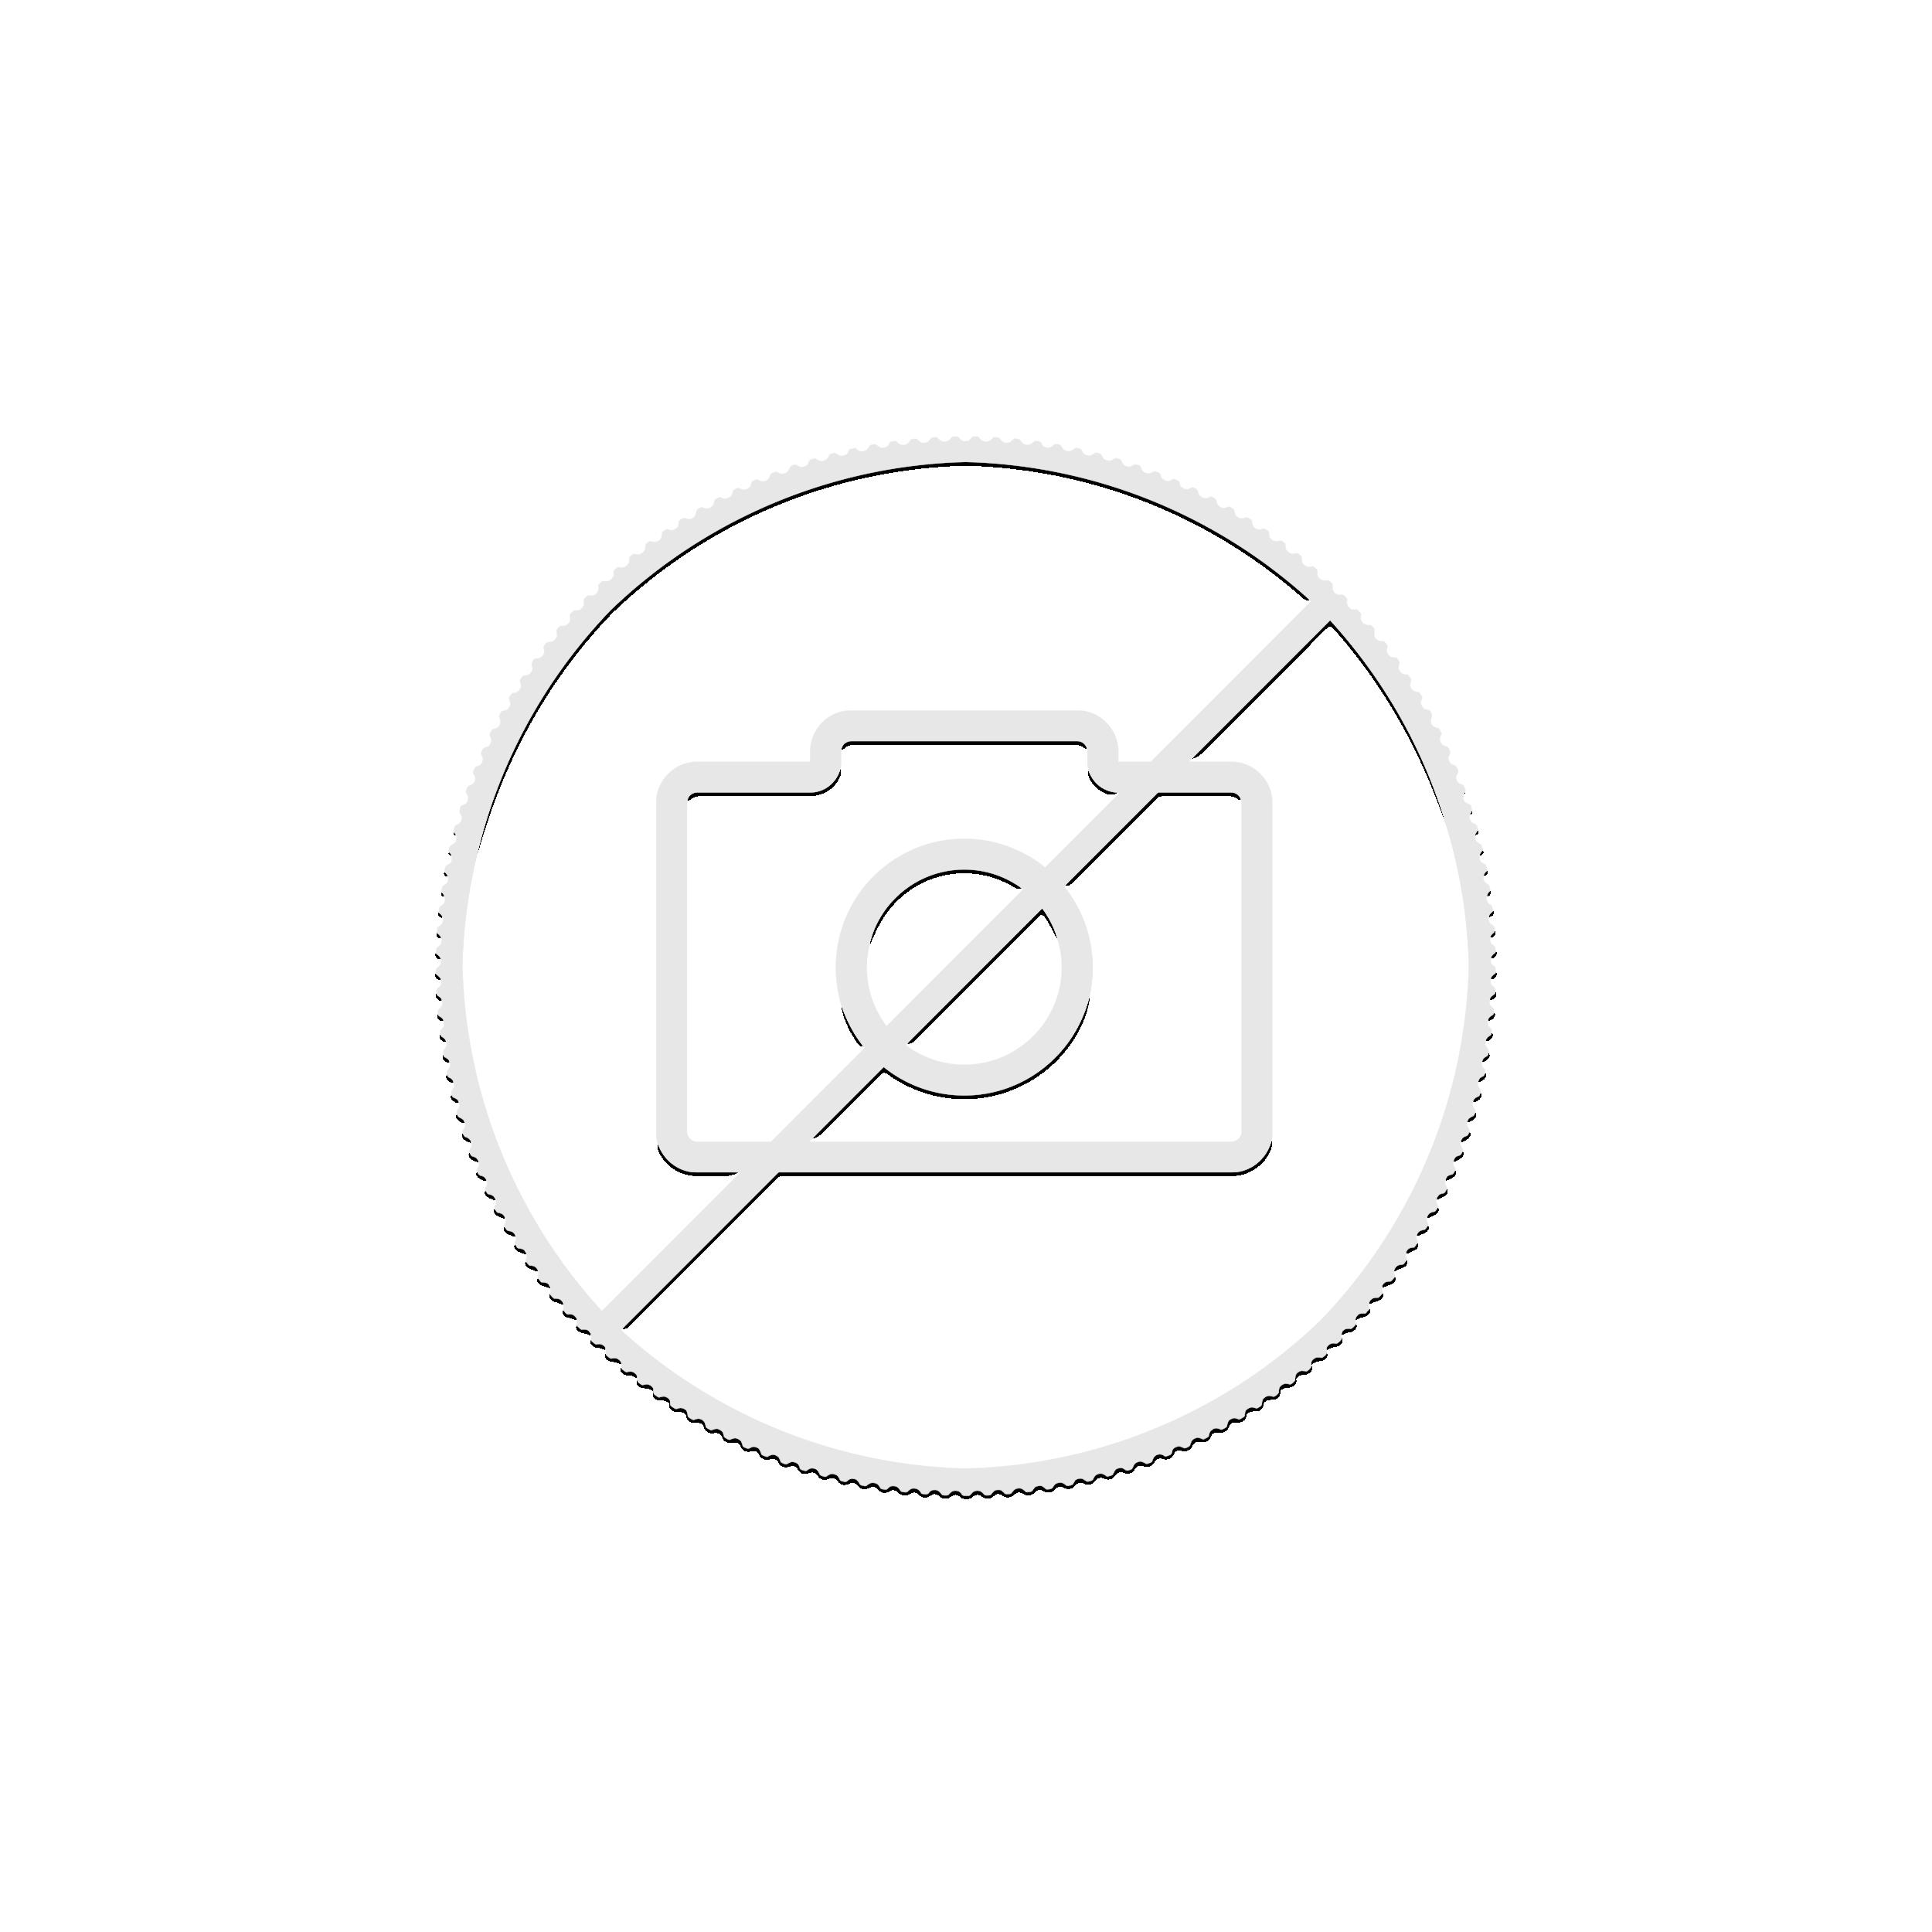 1 troy ounce silver coin Caribbean Seahorse 2021